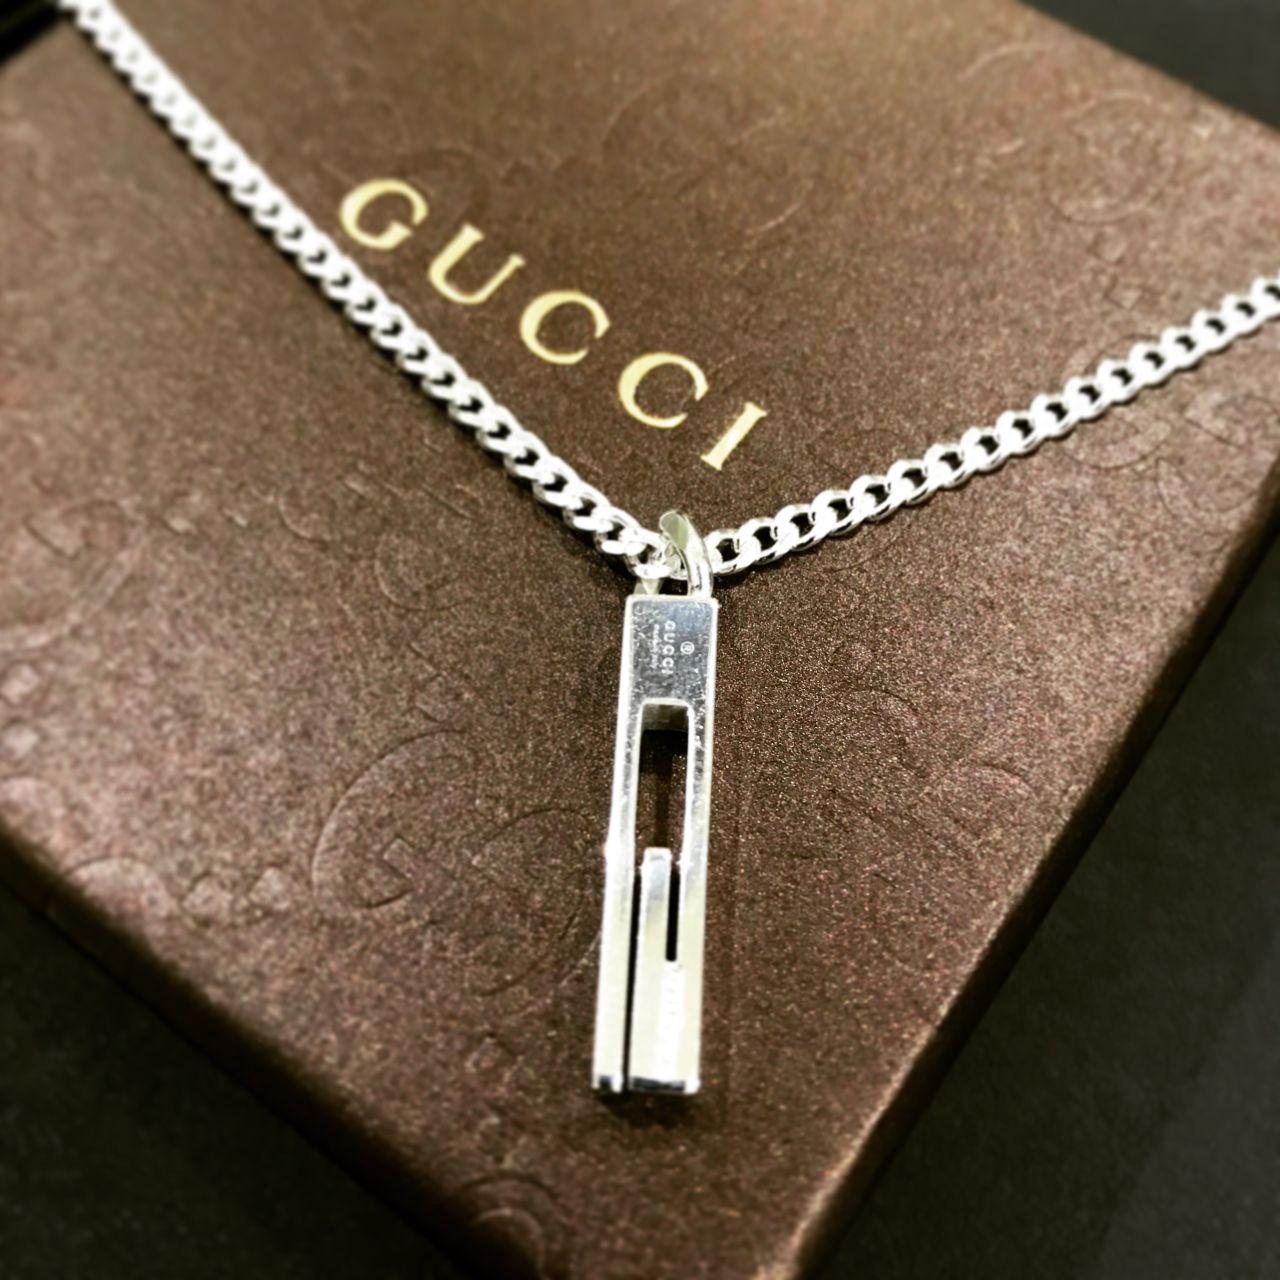 buy online 510fe 70b4d GUCCI シンプルネックレス   静岡店   フィットハウス公式 ...